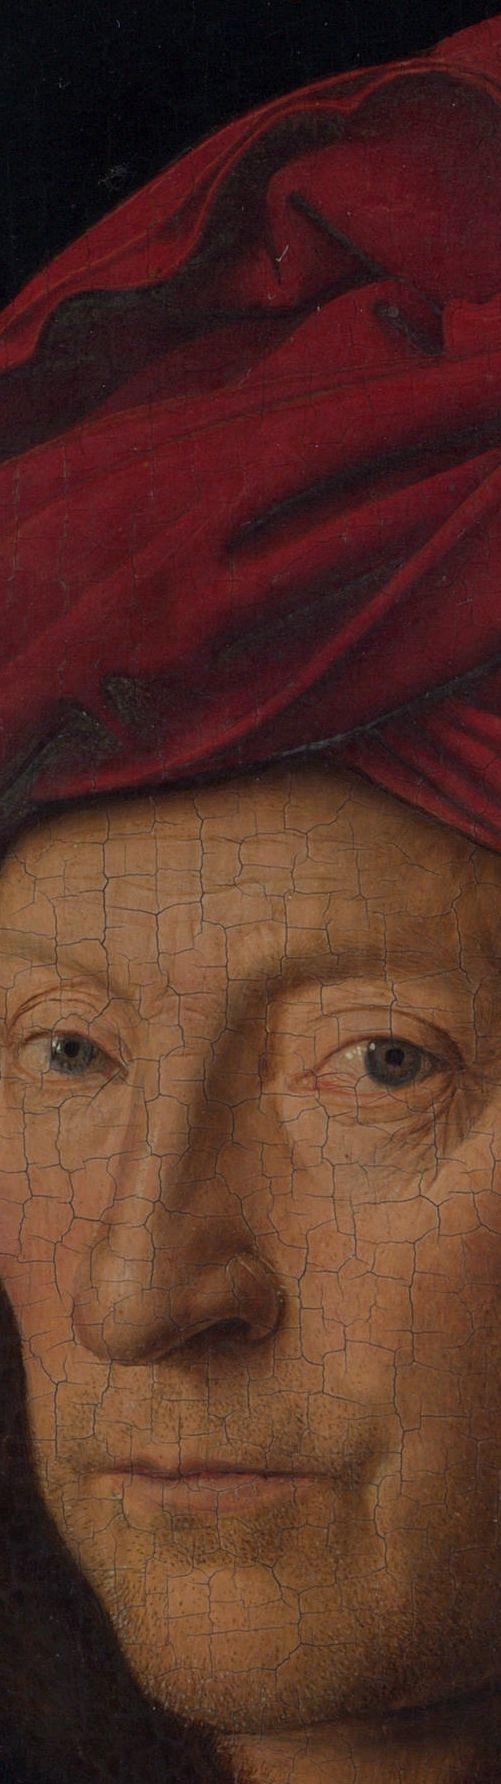 Jan van Eyck Portrait of a Man ( Man in a Red Turban) 1433 (detail)